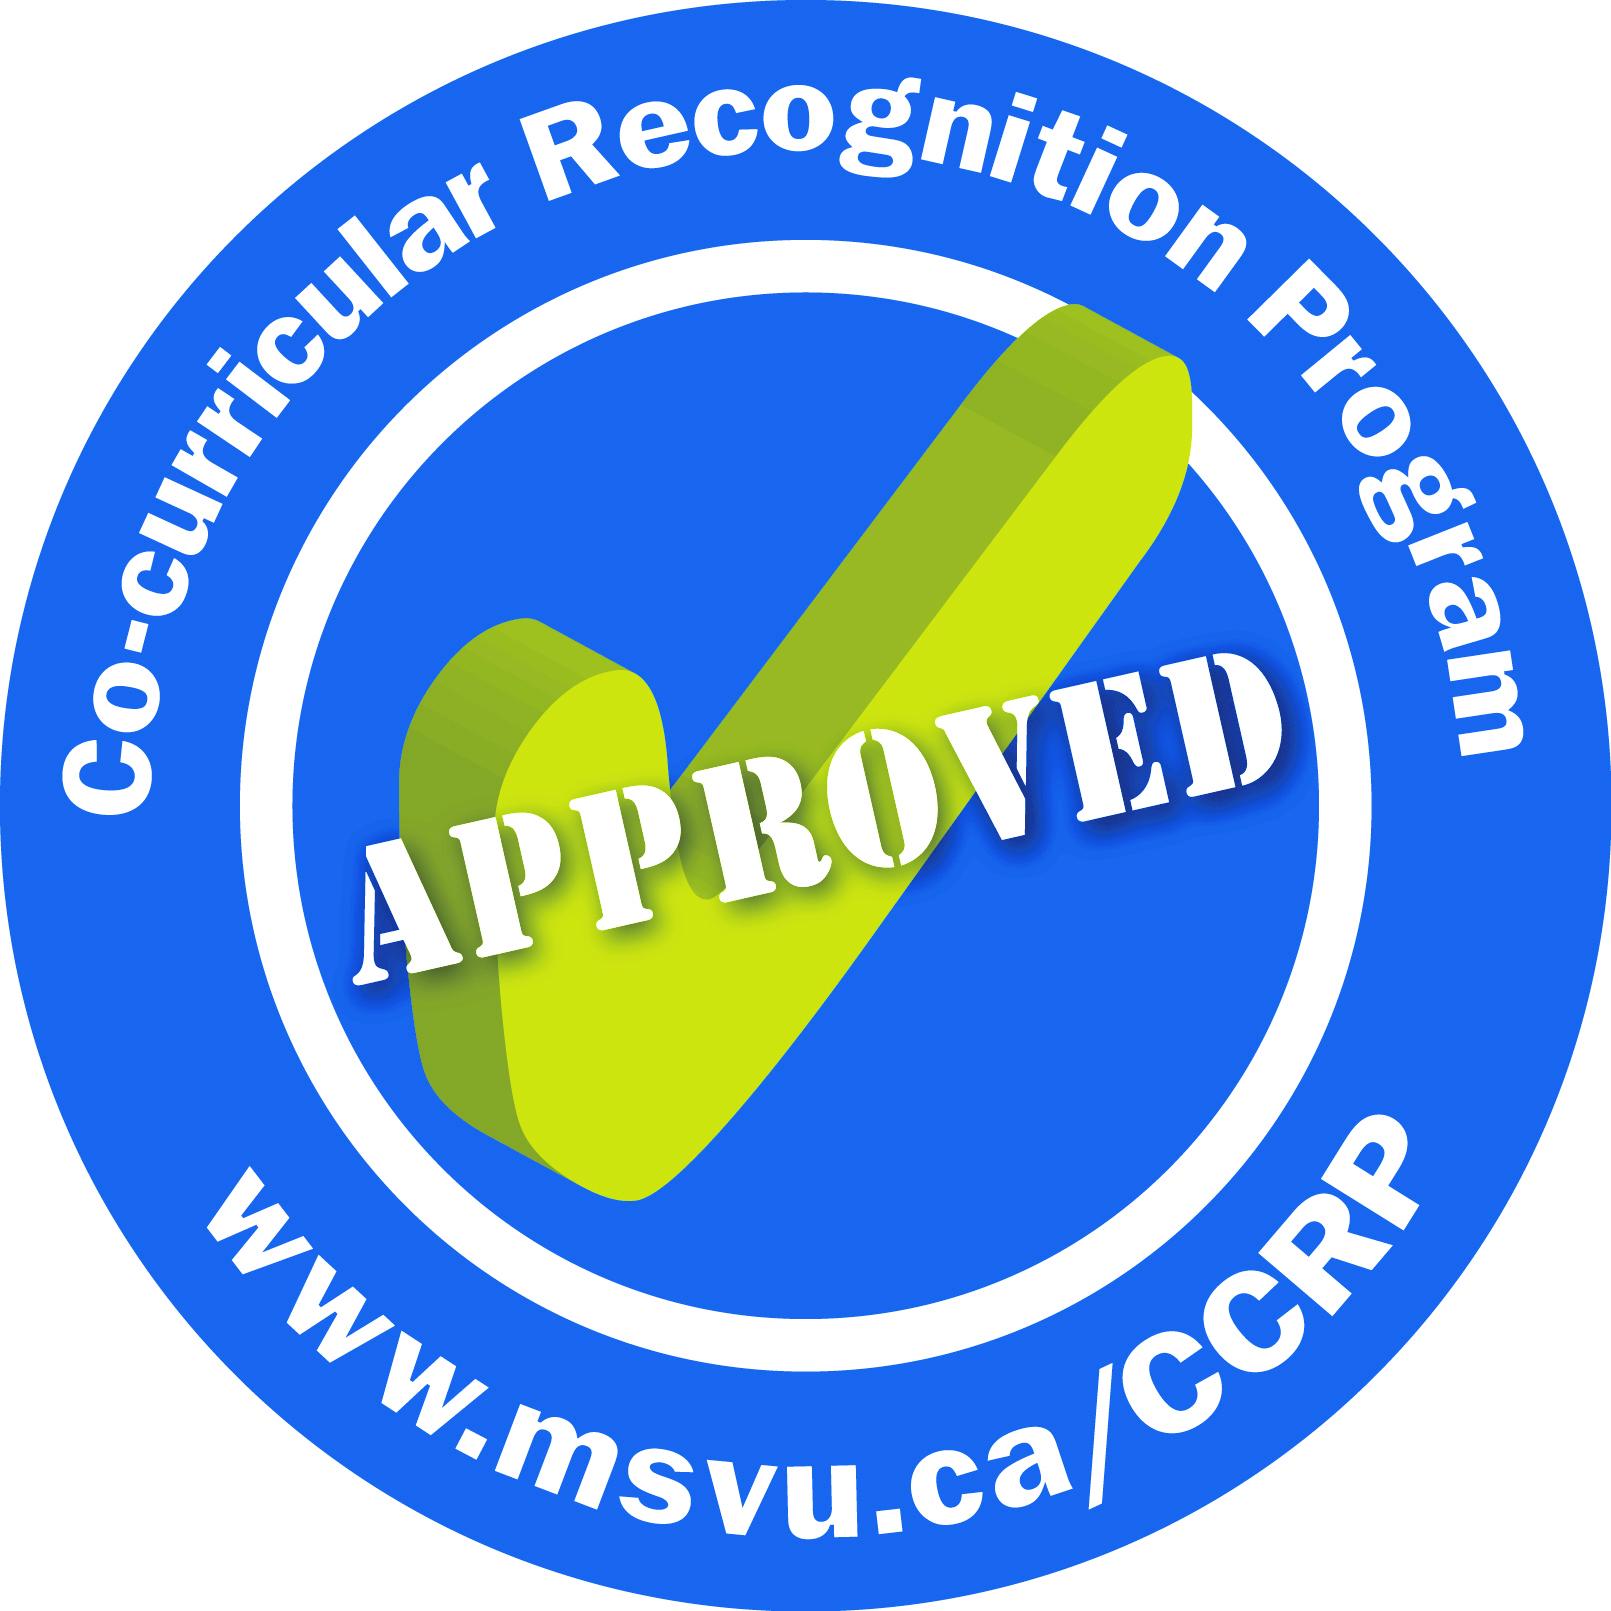 MSVU-CCRP Logo